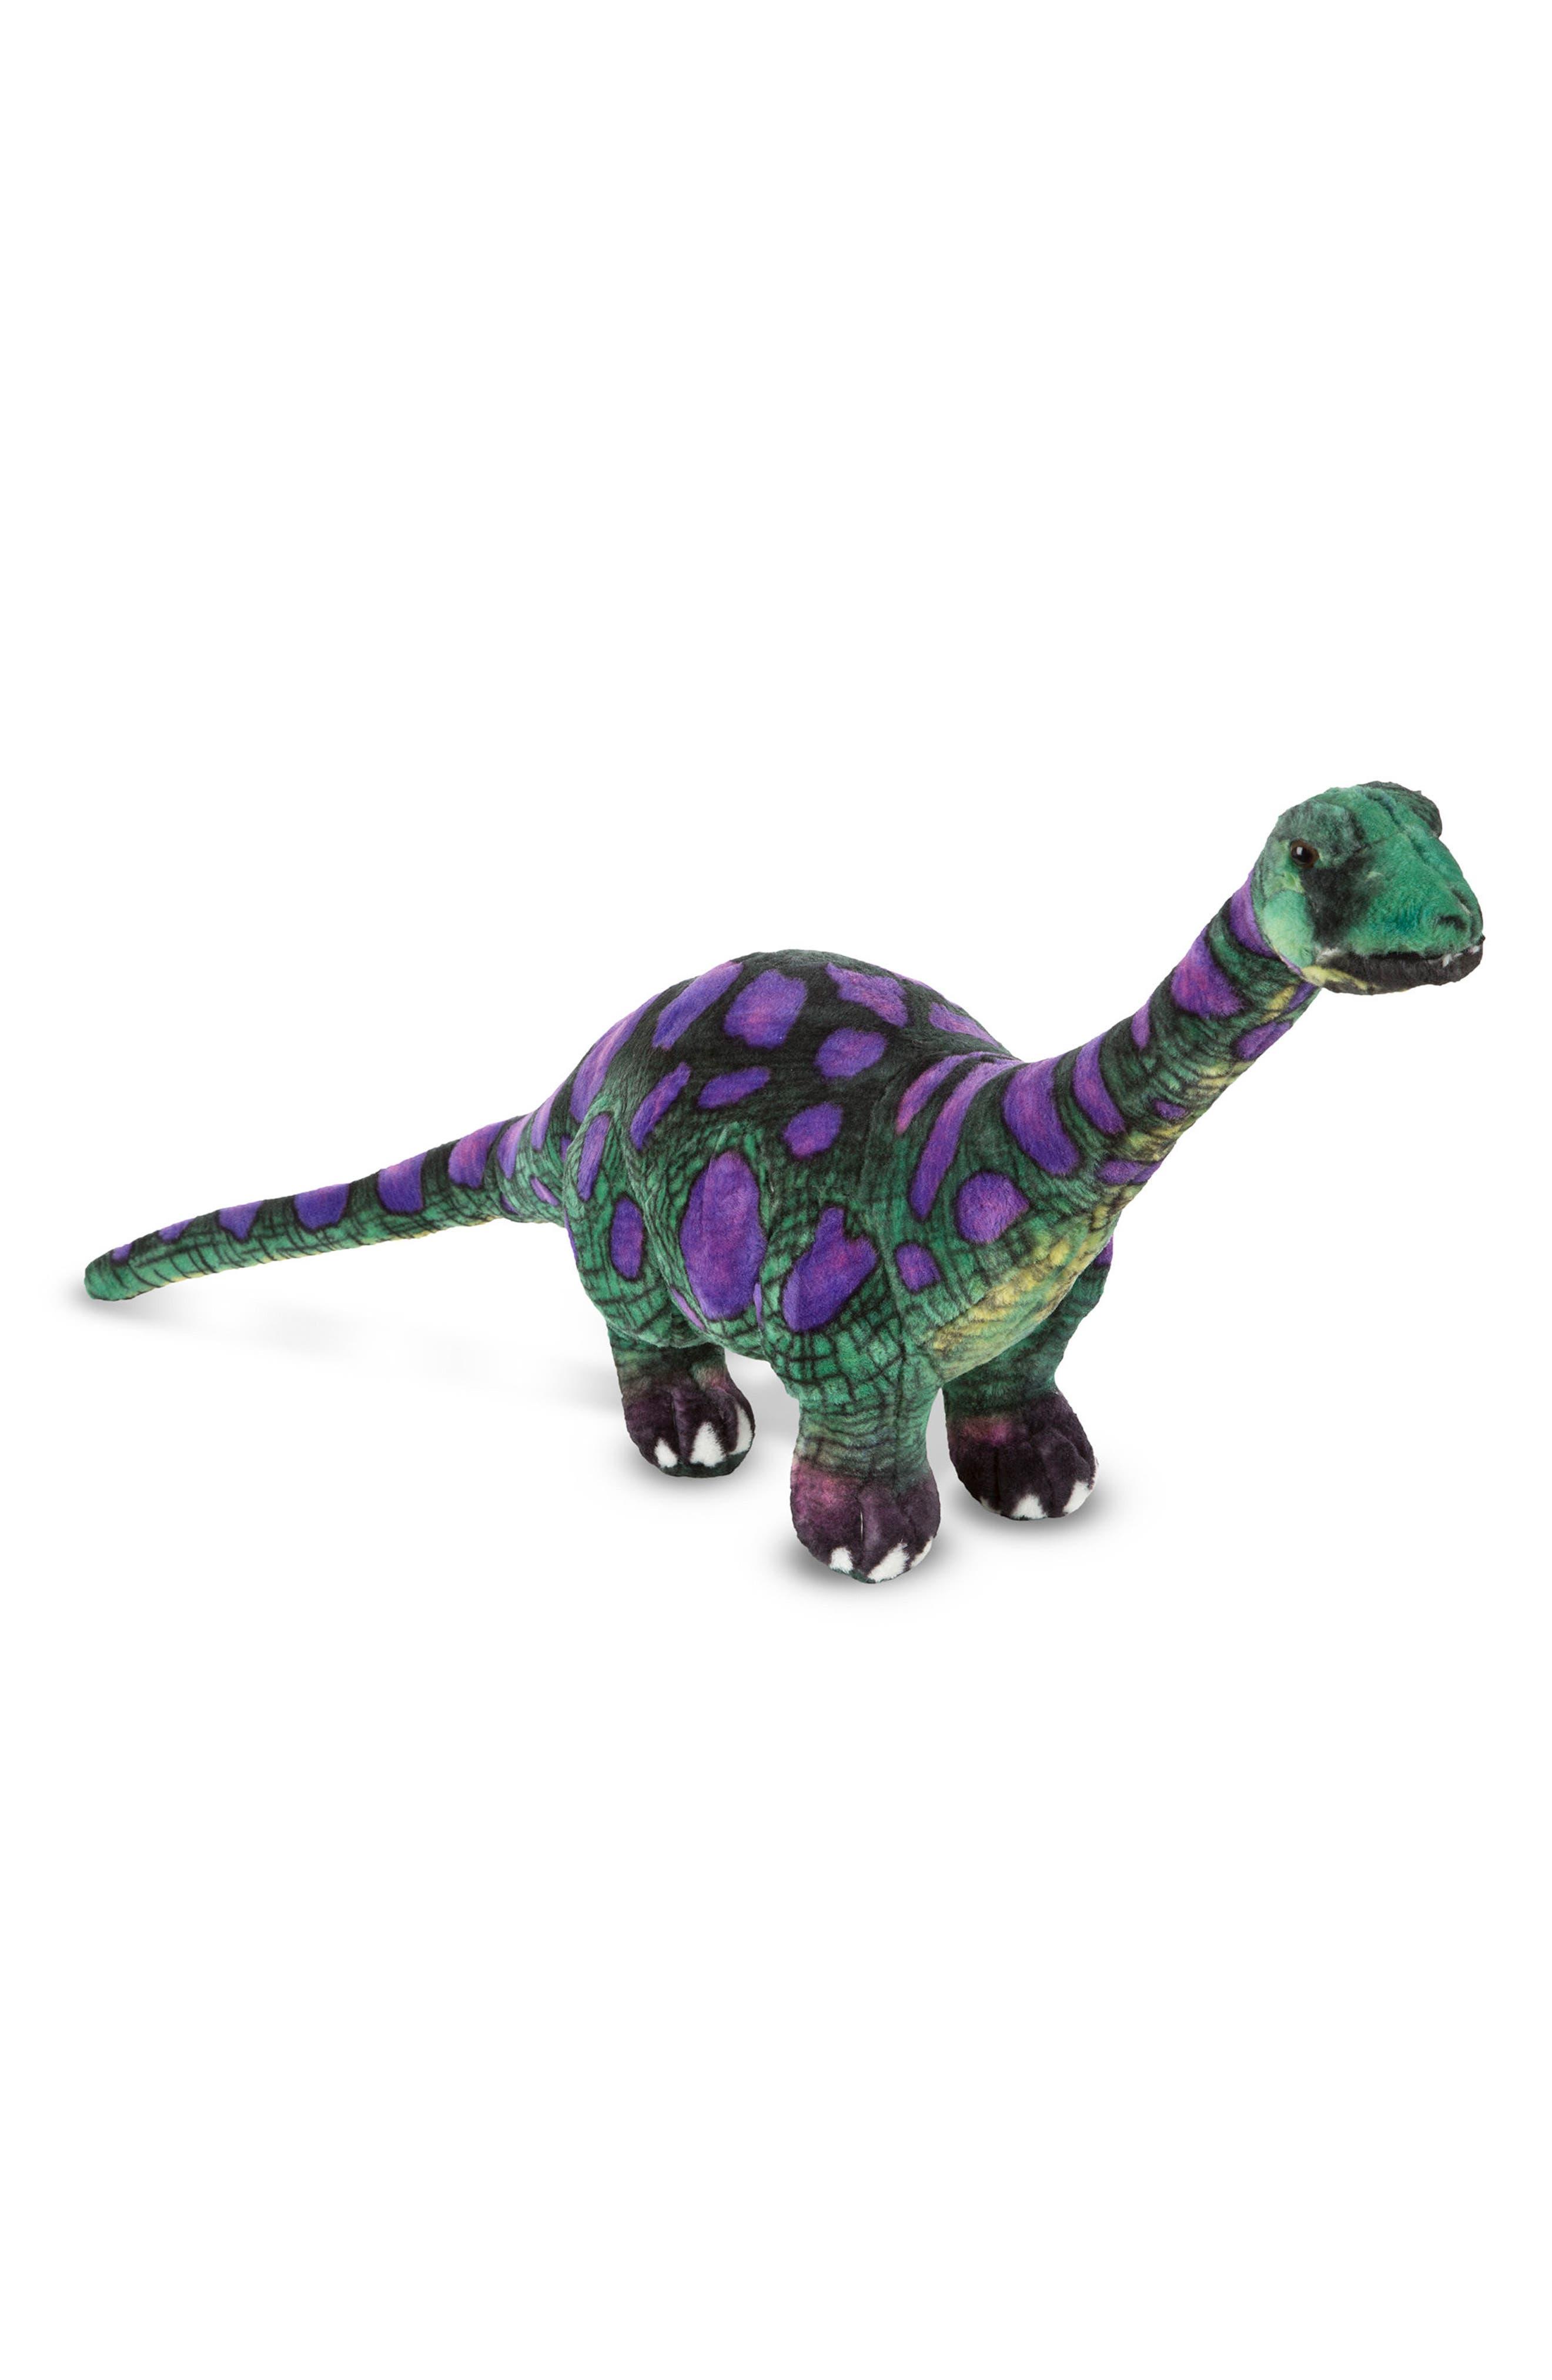 Apatosaurus Stuffed Animal,                             Main thumbnail 1, color,                             300